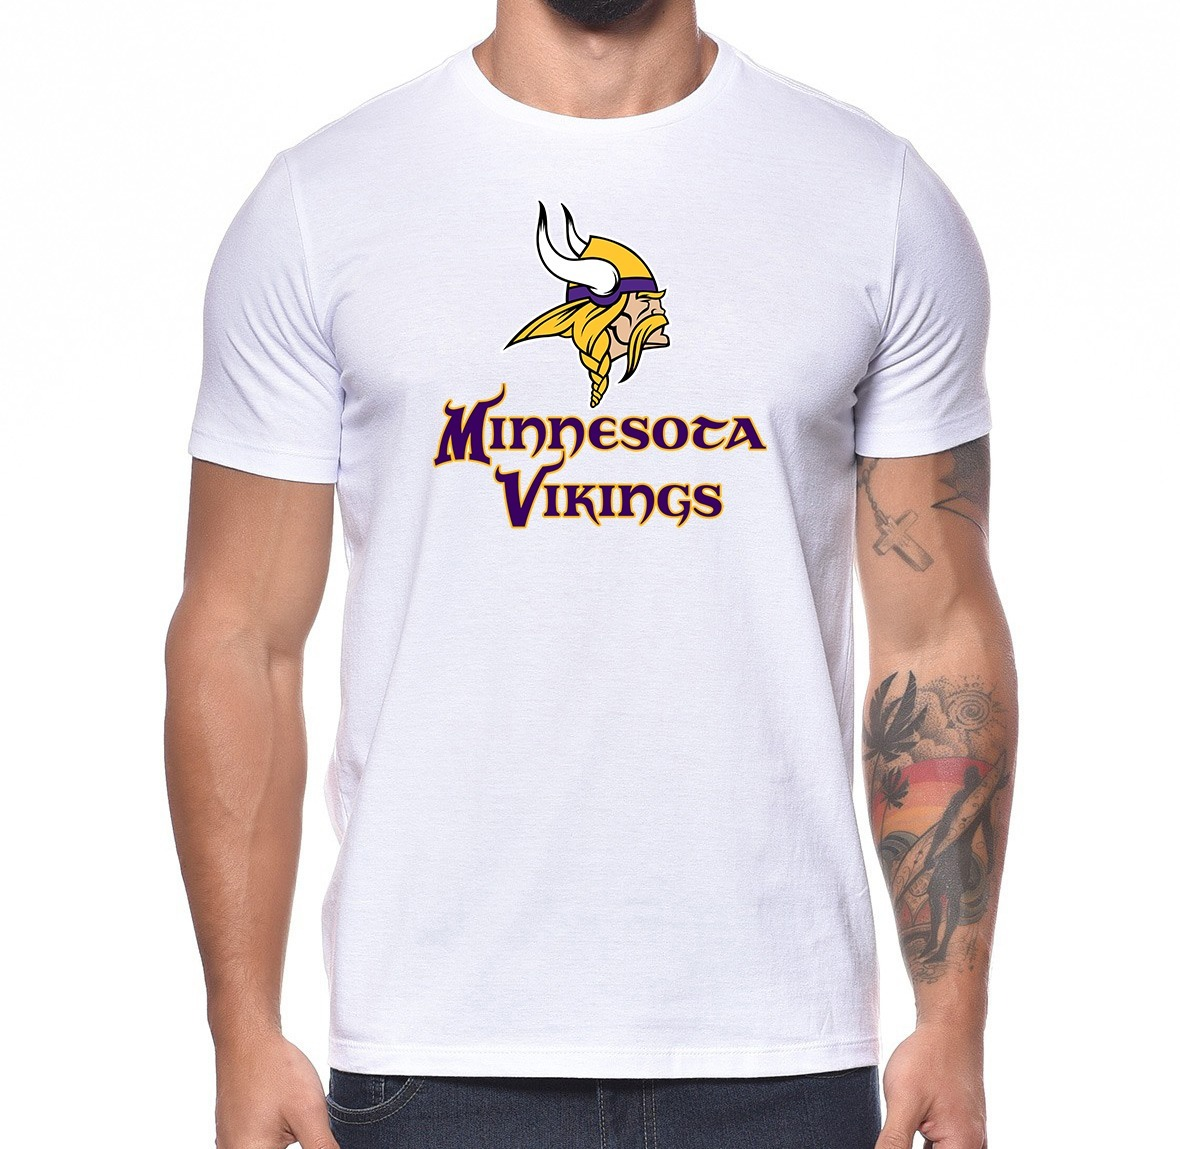 2ffcb3c59 camiseta minnesota vikings time futebol americano nfl m02. Carregando zoom.